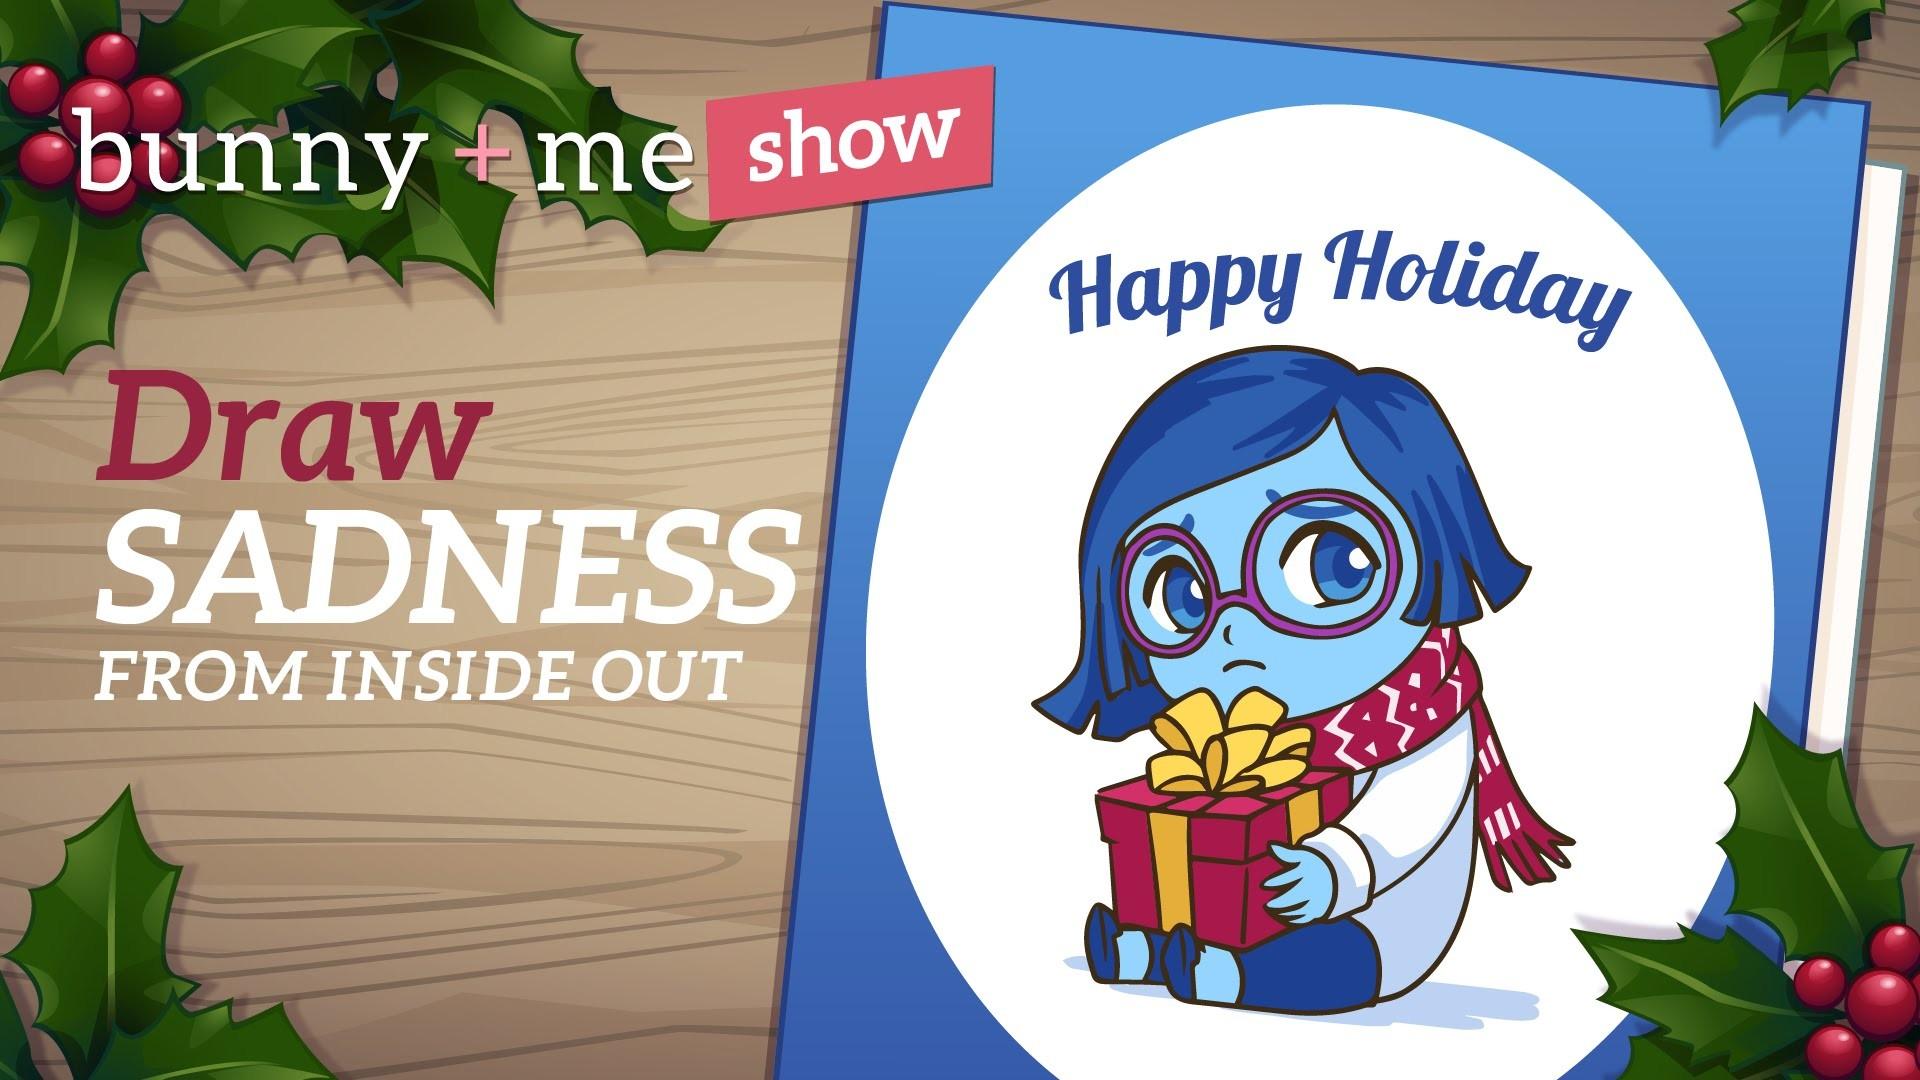 How to draw Sadness - Christmas Card art